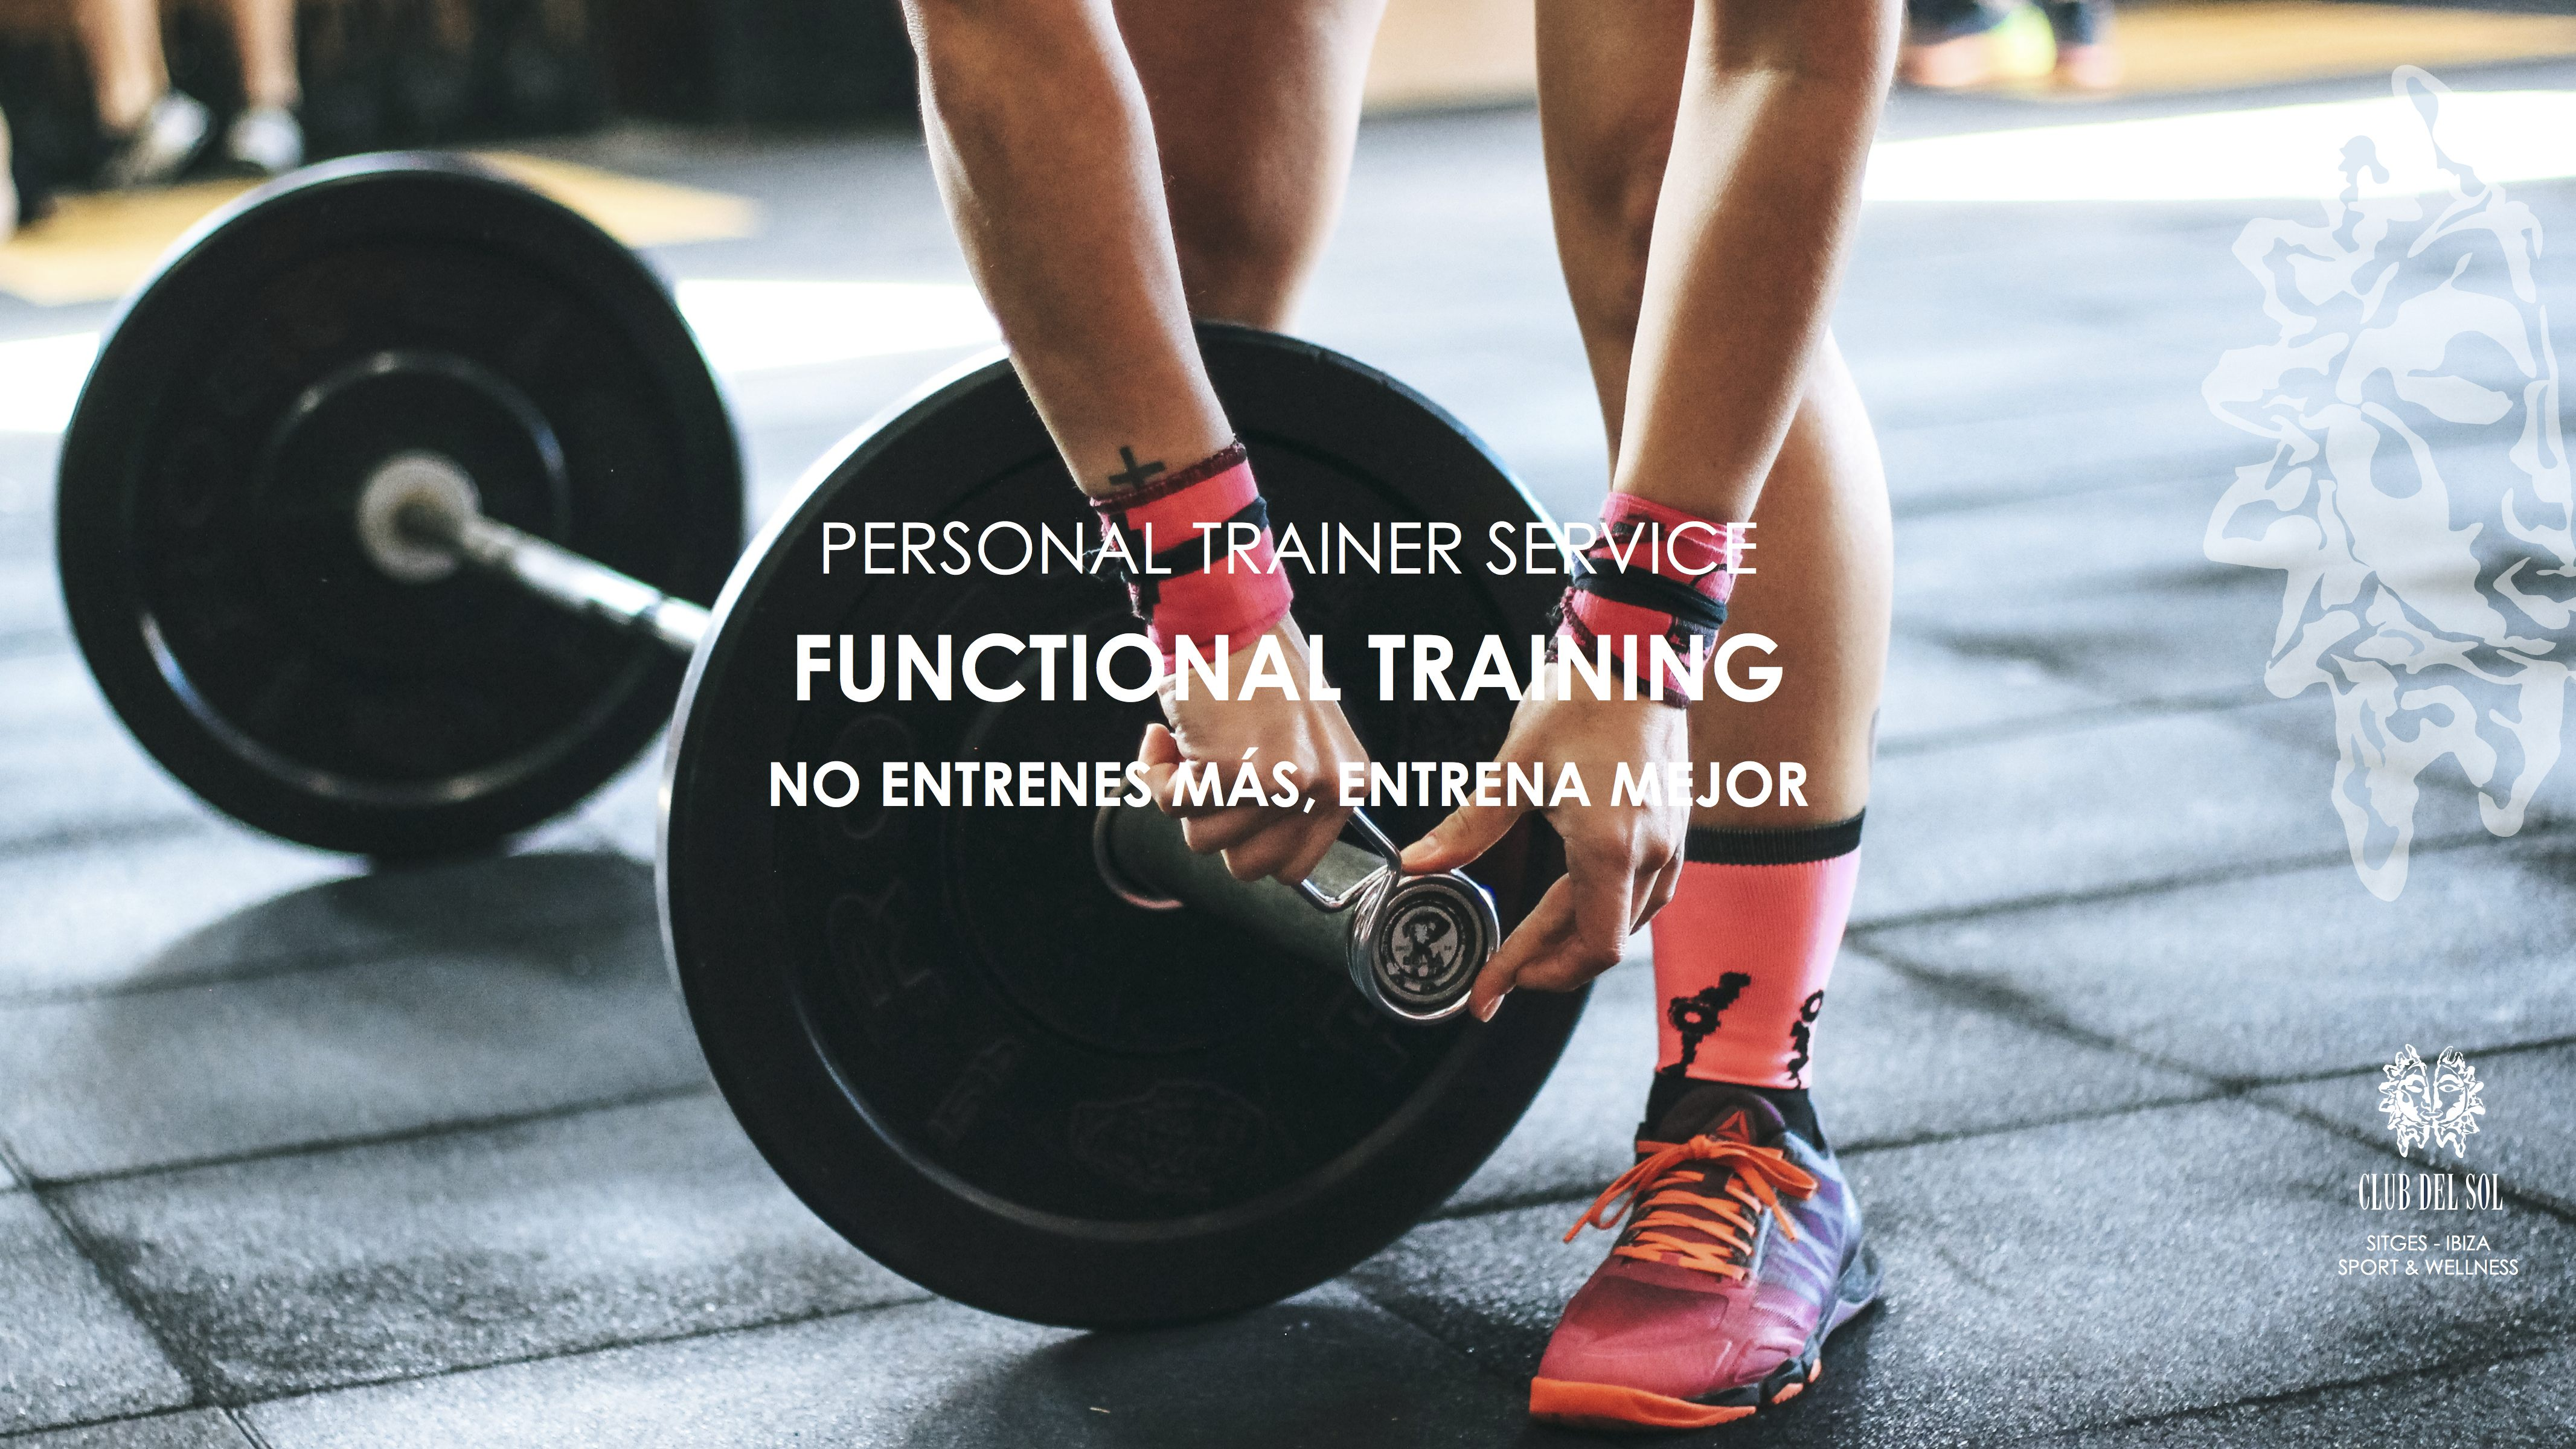 Fuctional trainig workout club del sol sitges